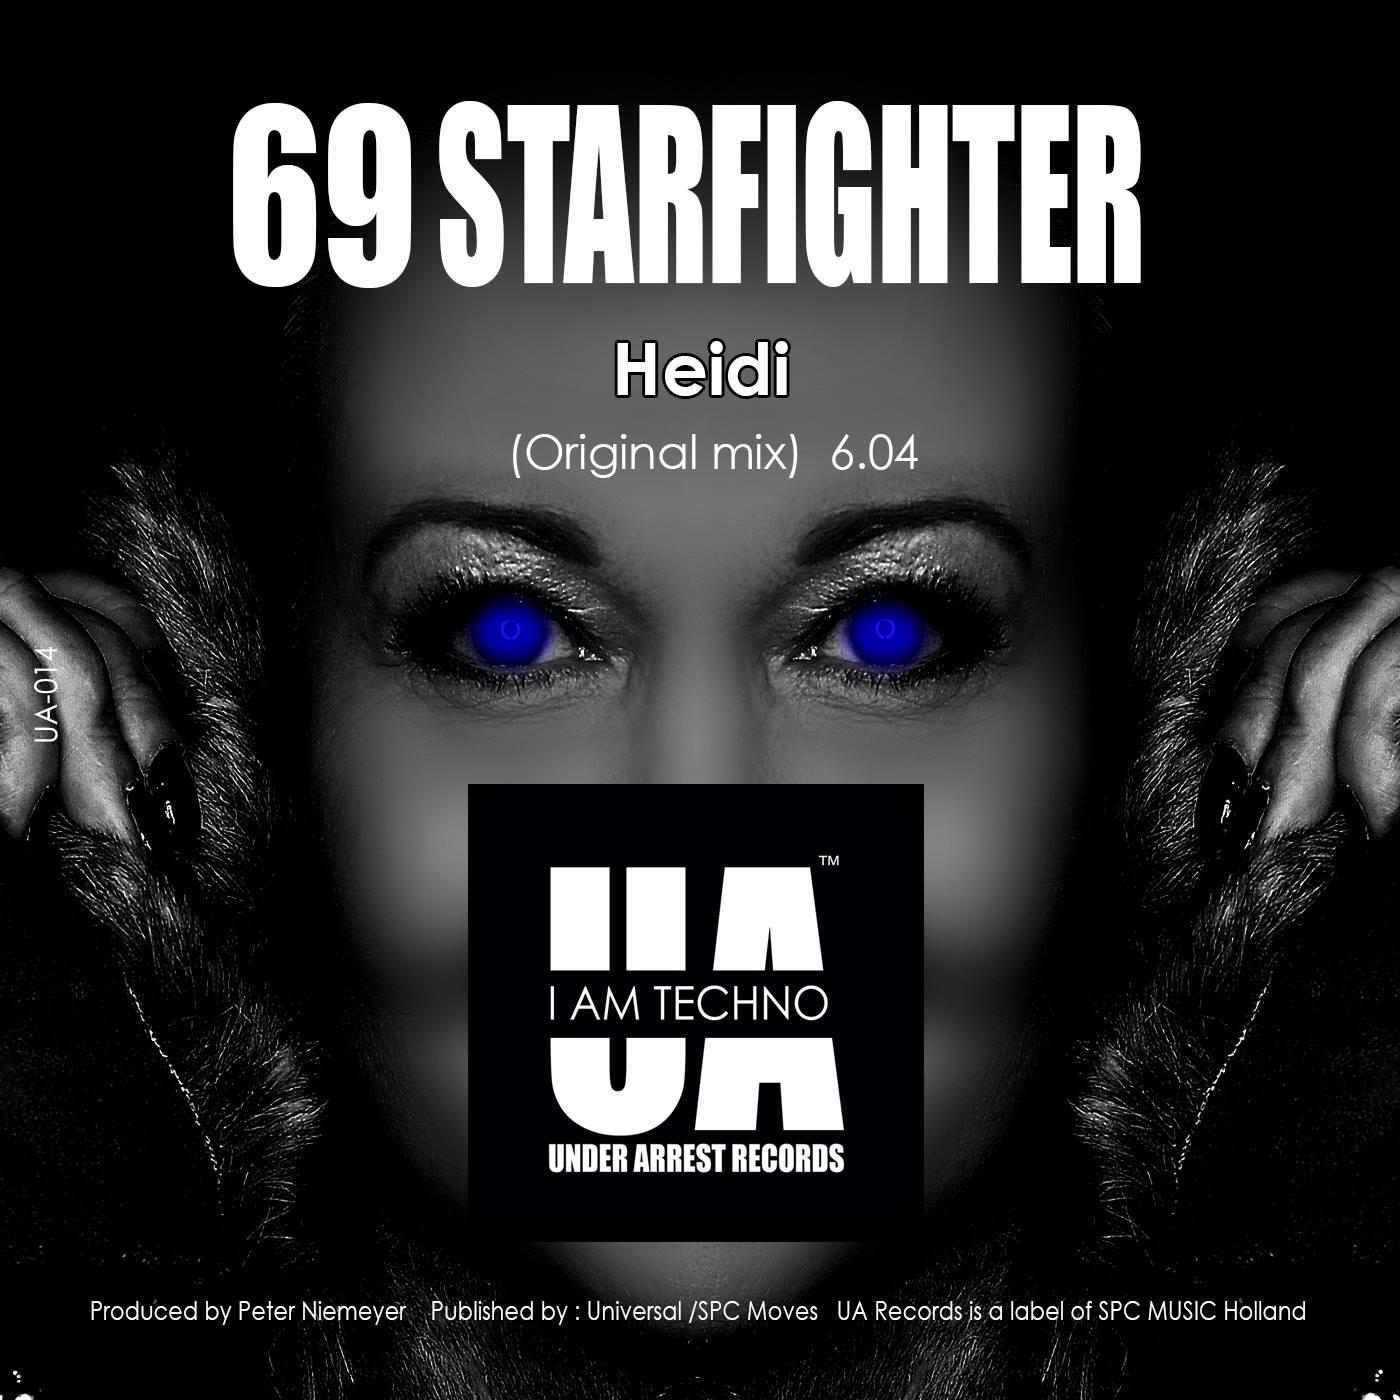 UA Records, Techno, Techno-Label, Amsterdam, Holland, 69 Starfighter, Under Arrest Records, Iam Techno, Dark Techno, 69 starfighter, Dona King, Cinema Airport, JANICE & JASON DREAMWALKER, Heidi vom Lande, Bloggerin, Techno-Gesicht, Album